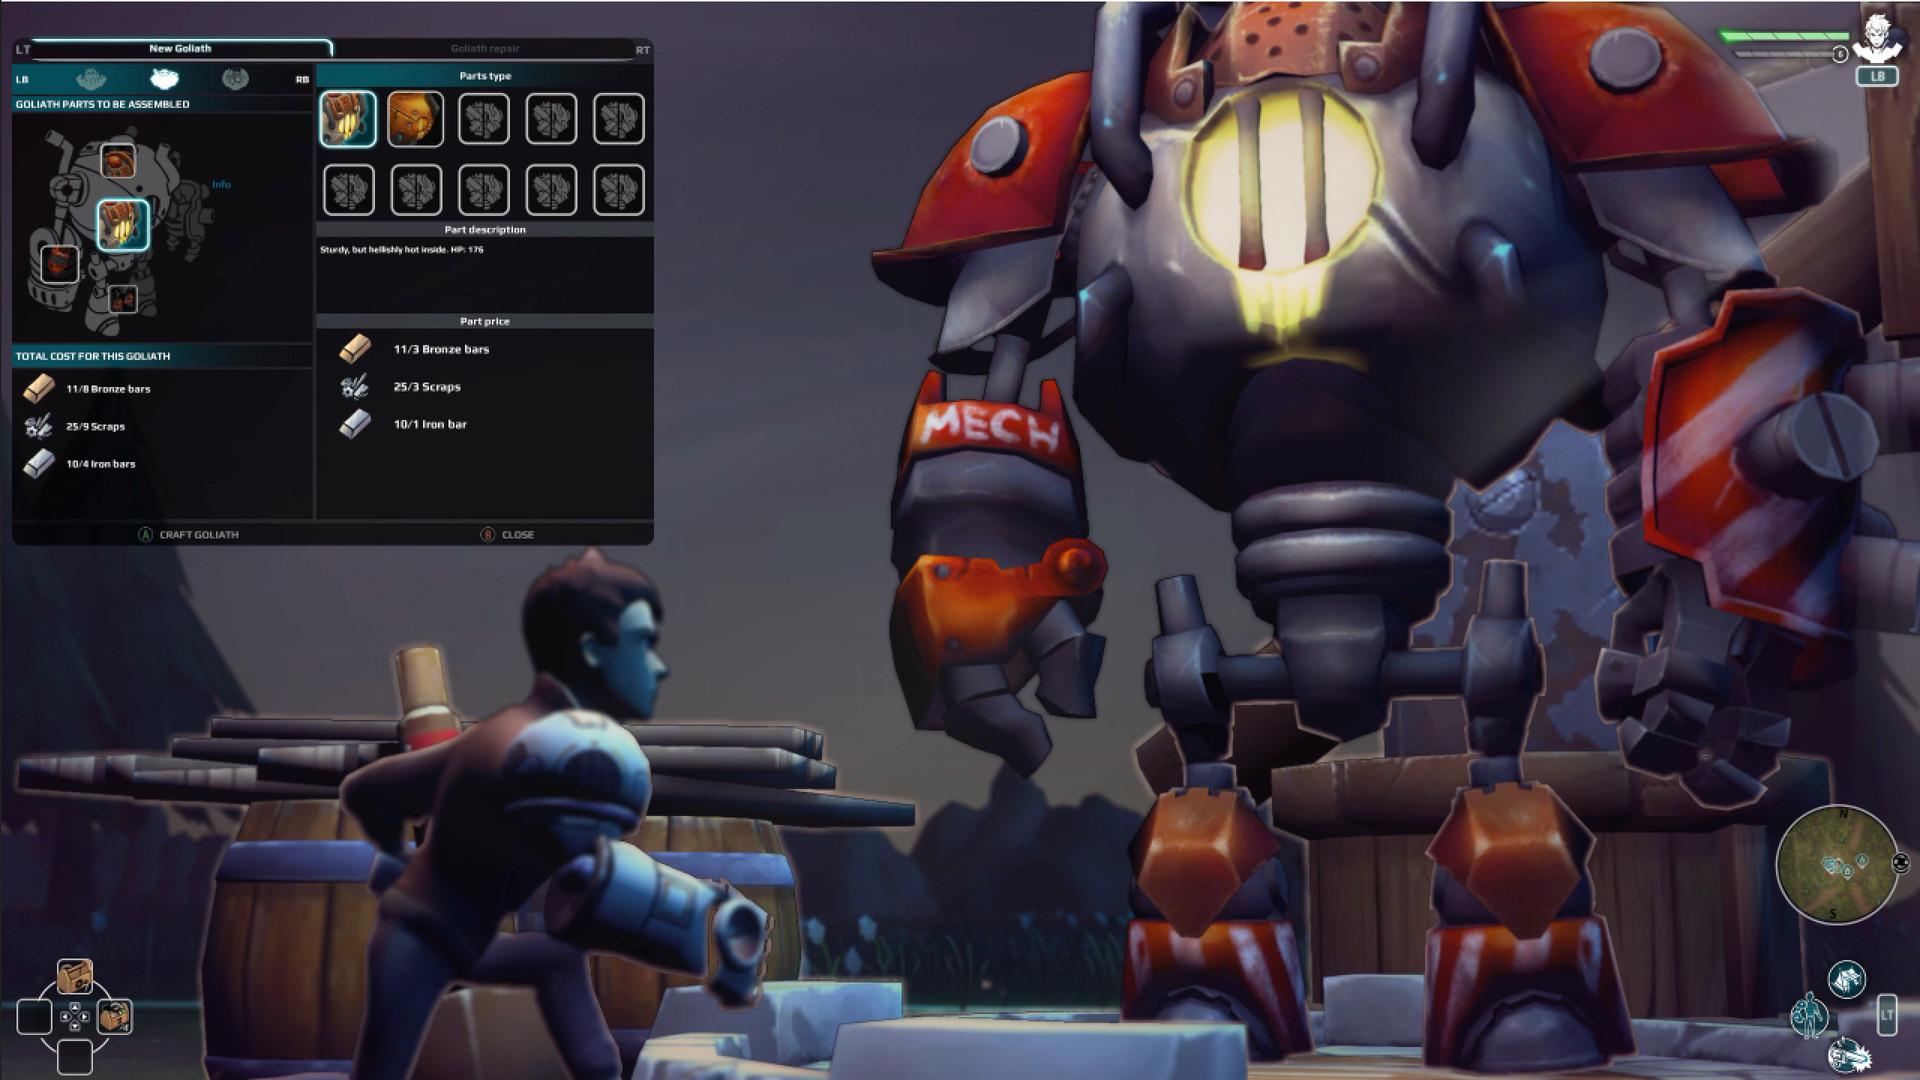 Goliath screenshot 3